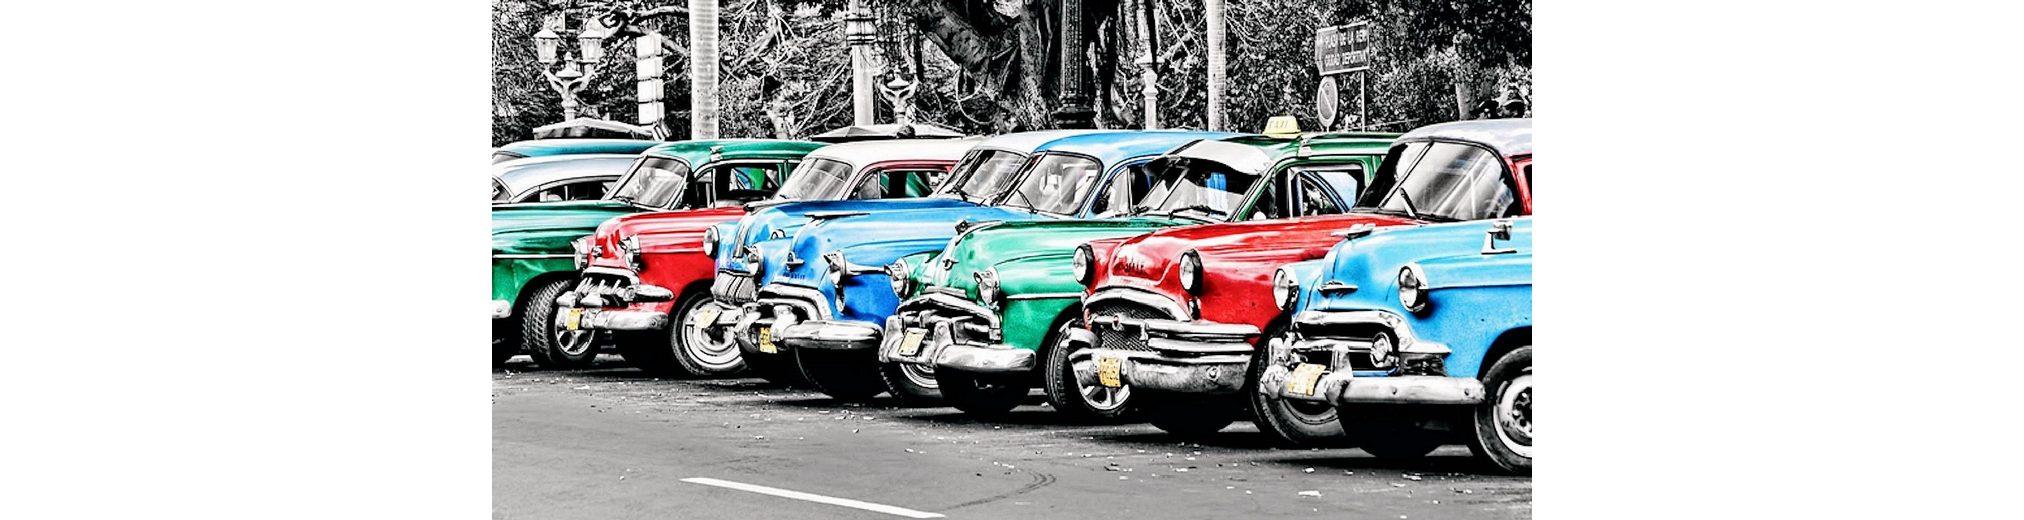 Home Affaire Bild, Kunstdruck, »John Lynn / Vintage cars in Cuba«, 70/33/1,3 cm